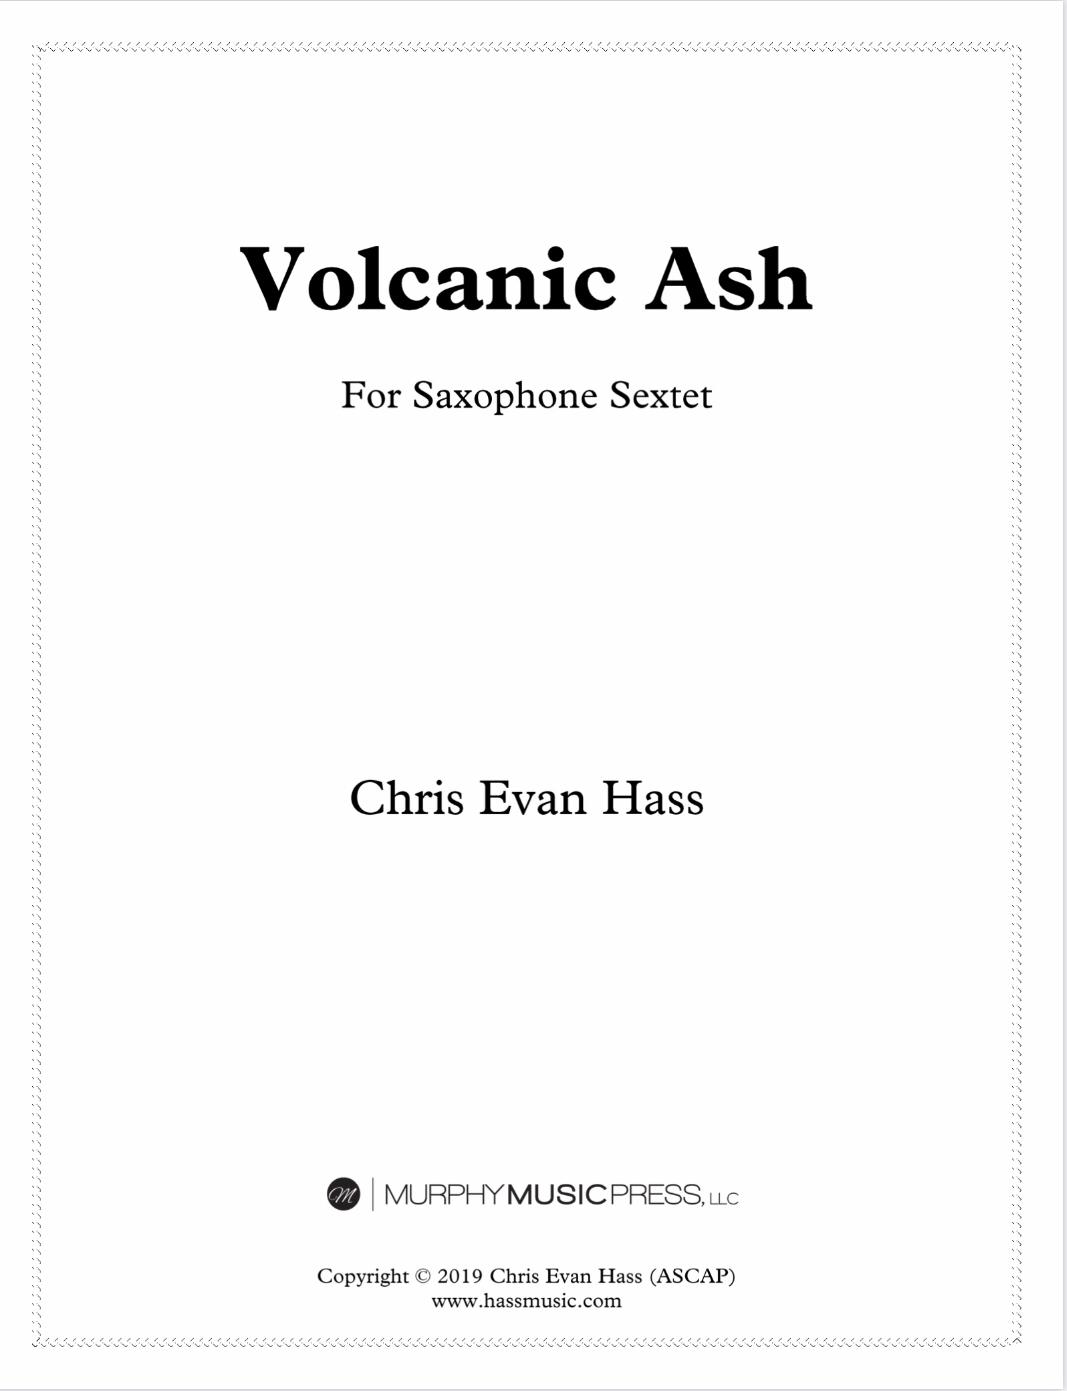 Volcanic Ash (Saxophone Ensemble Version) by Chris Evan Hass